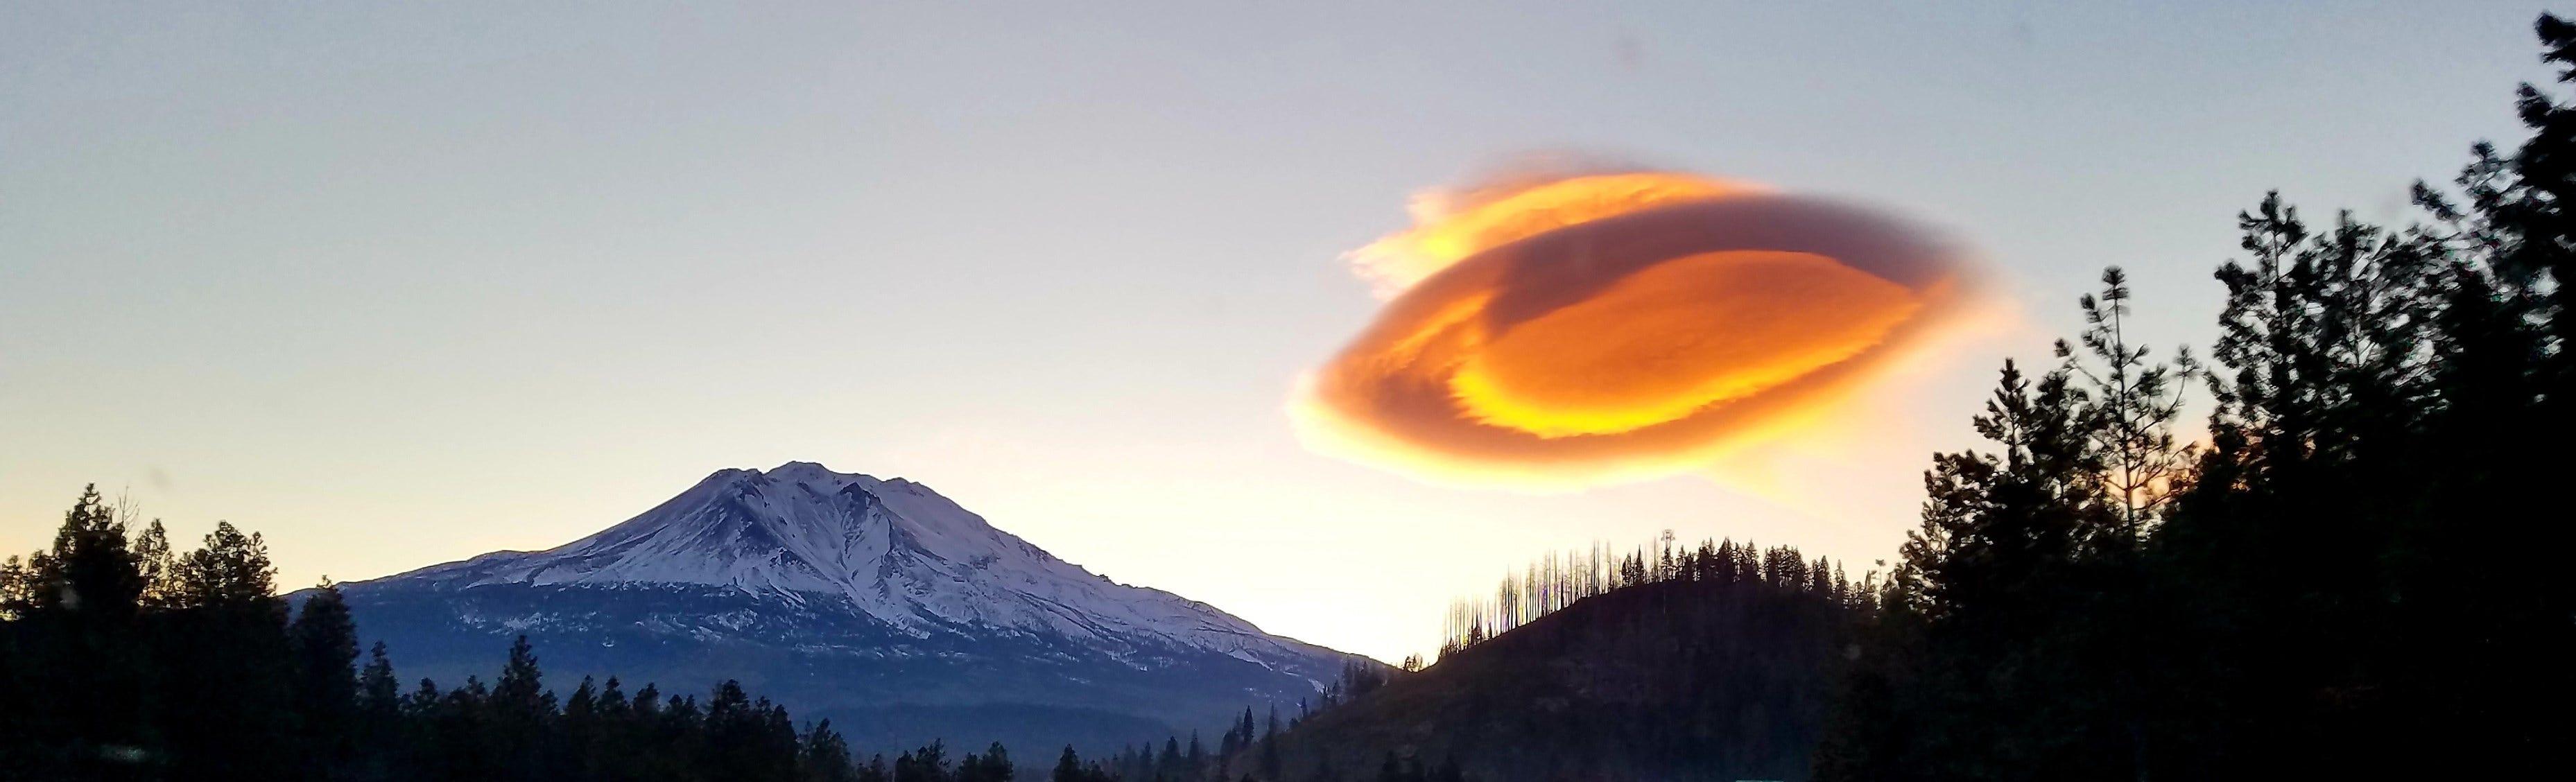 Lenticular Cloud near Mt. Shasta, California